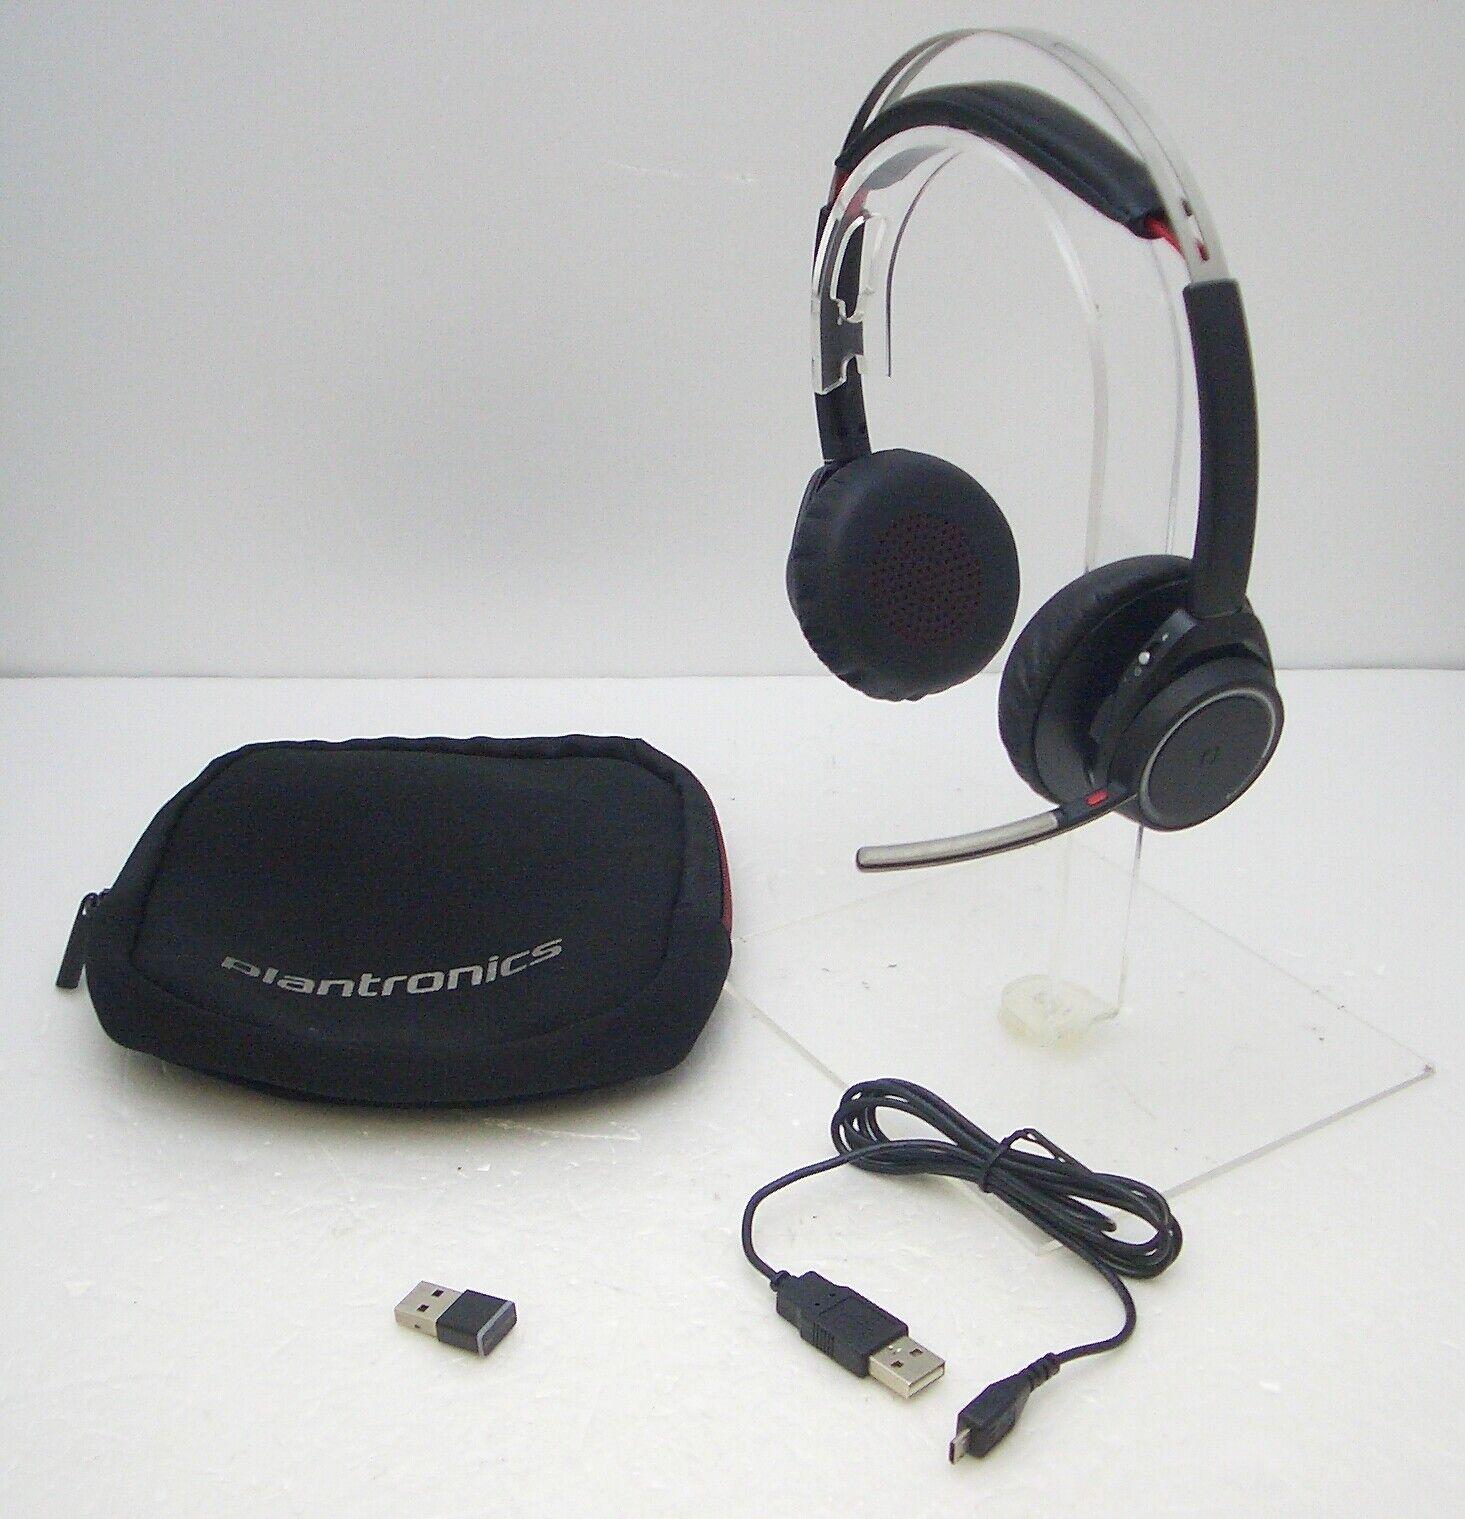 Plantronics Voyager Focus Uc B825 M Bluetooth Anc Headphones Skype For Business 17229150010 Ebay